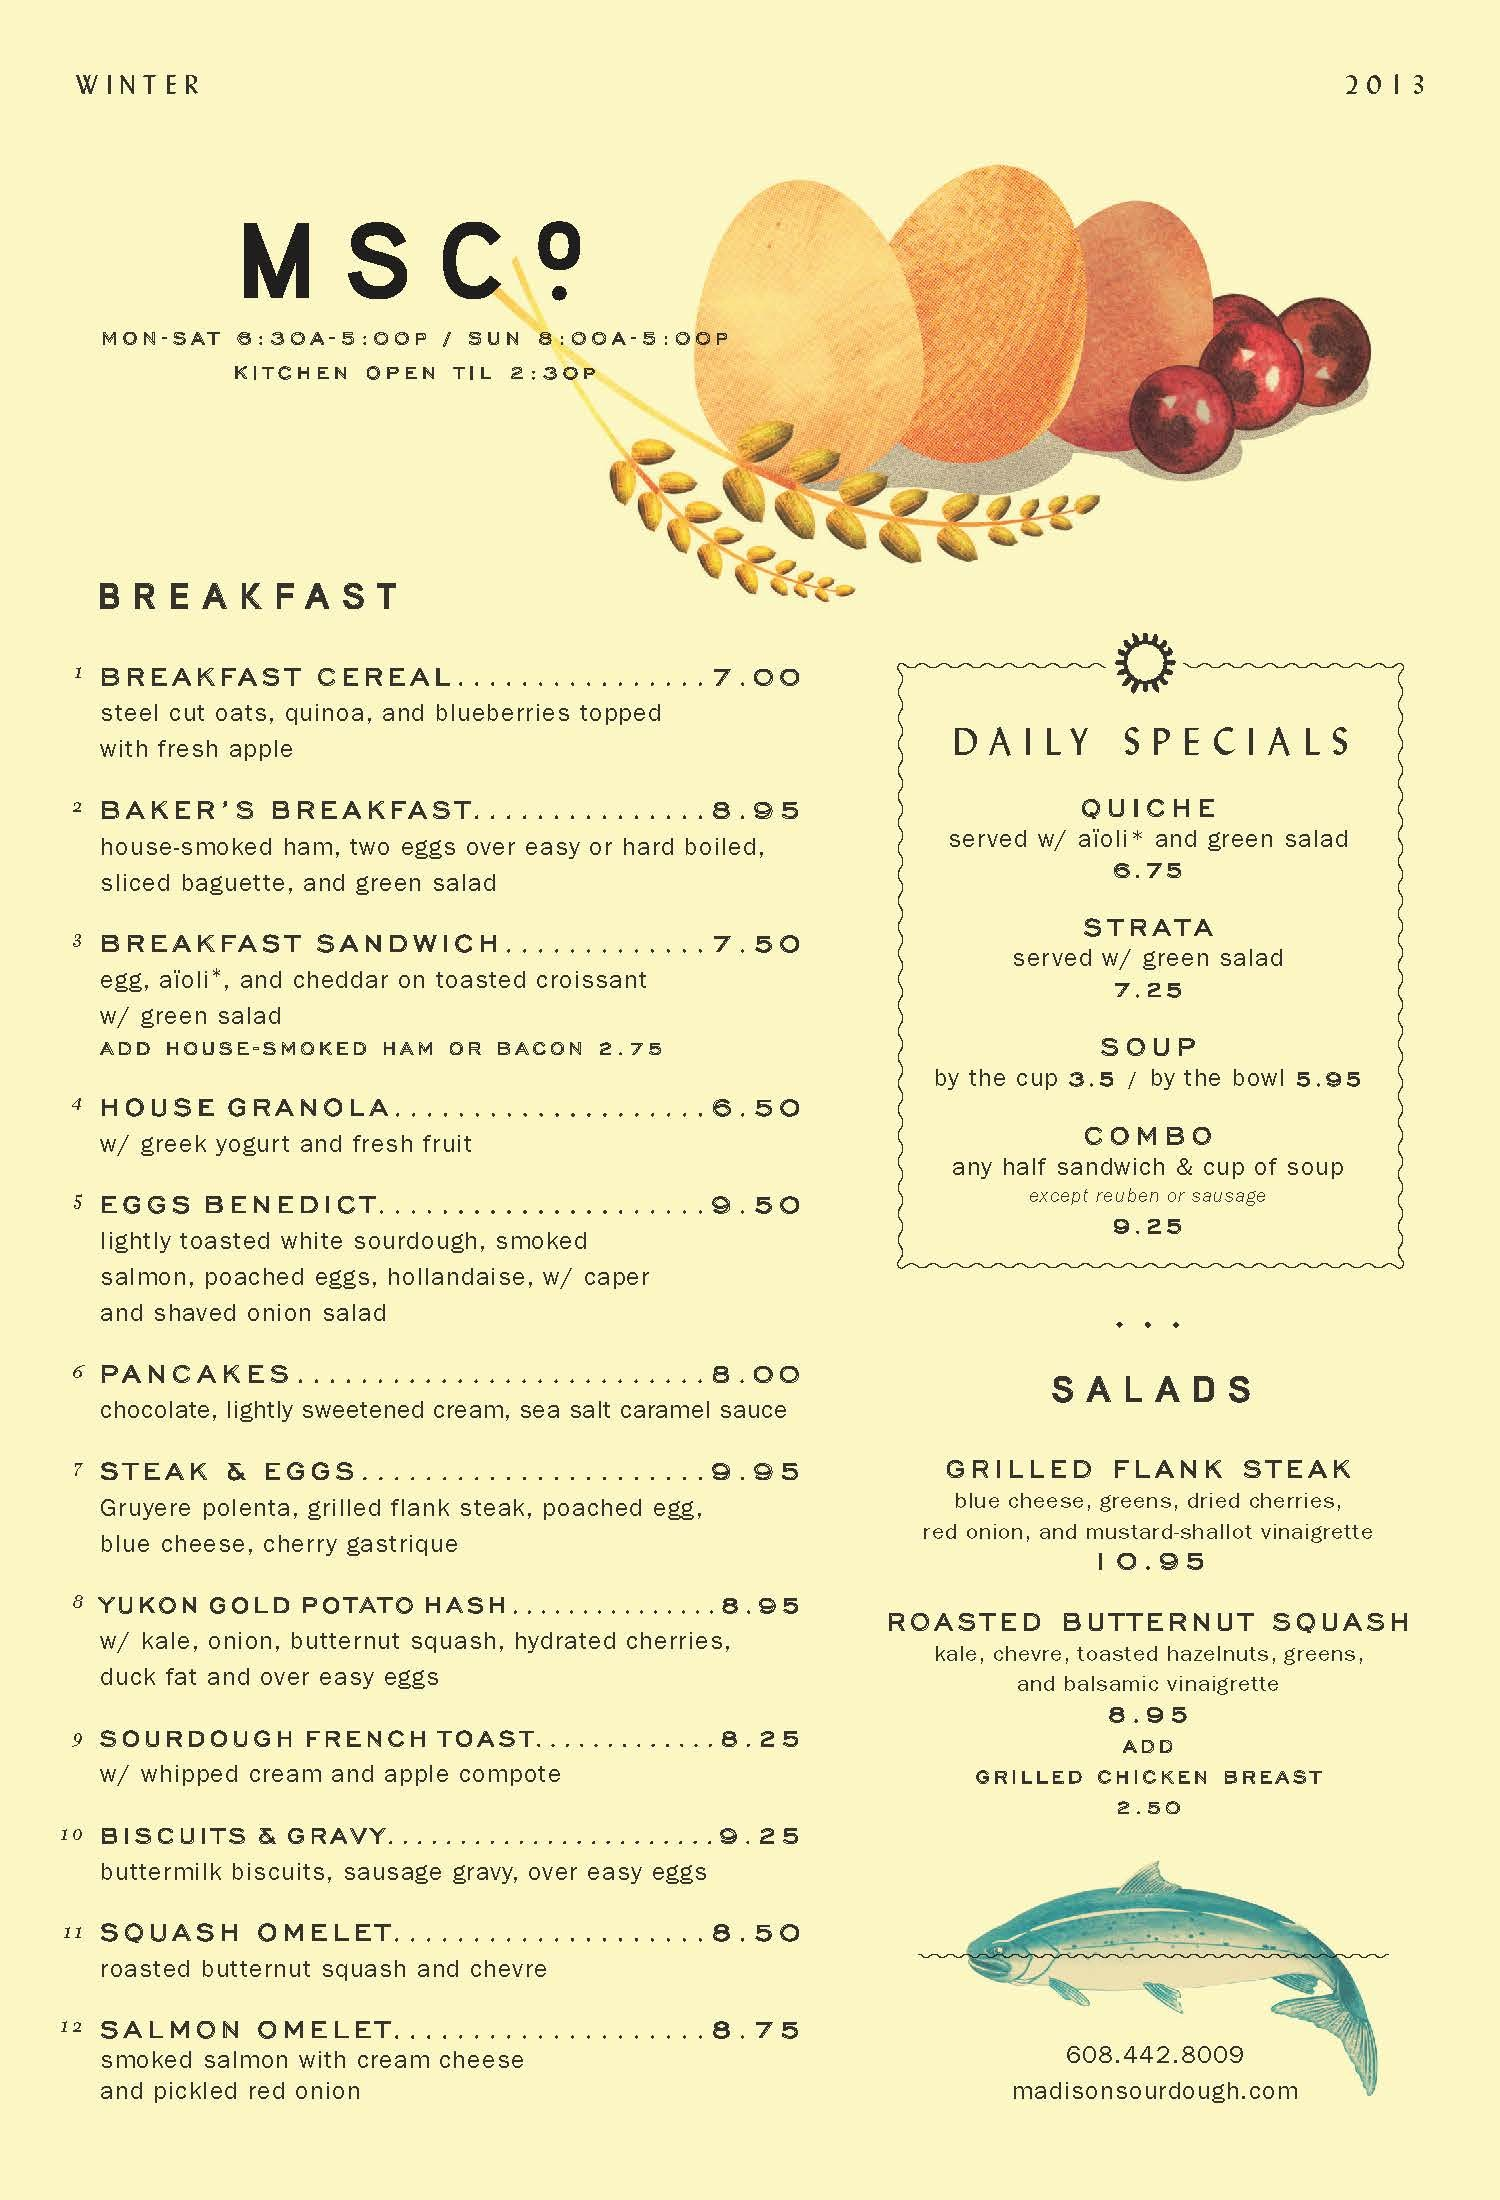 Madison Sourdough Winter Cafe Menu. | Design Inspiration | Pinterest ...